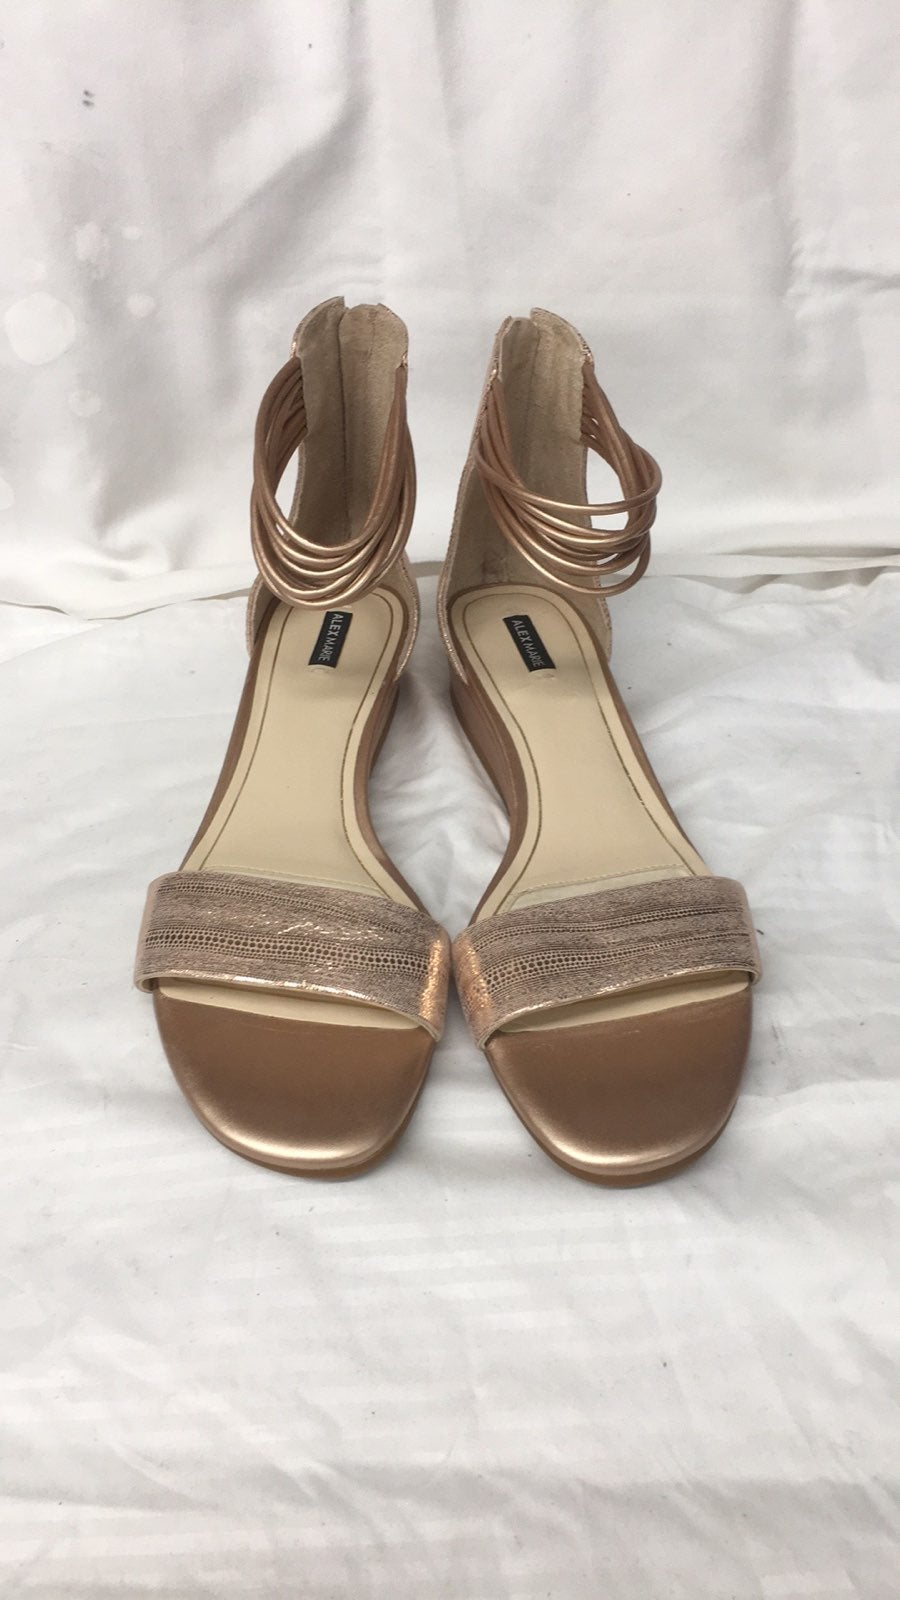 Alex marie New sandals ladies sz 10